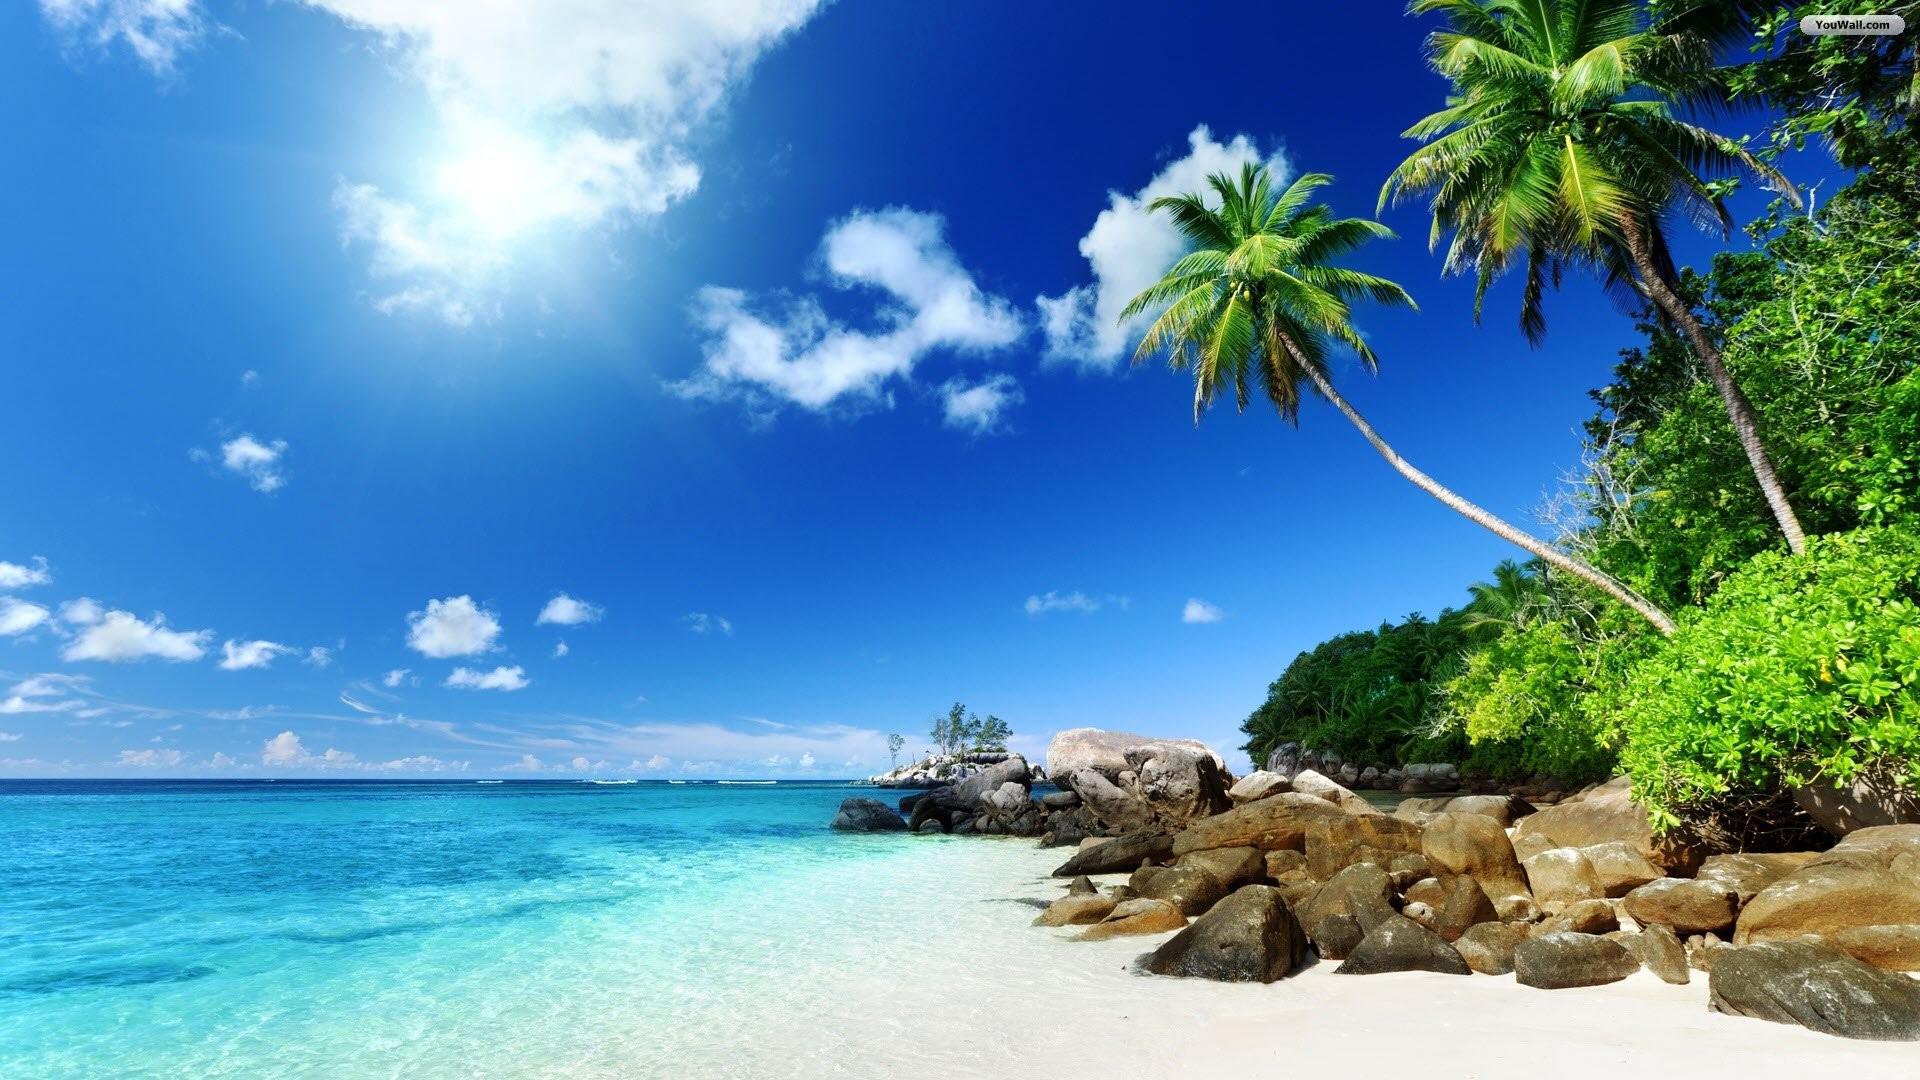 Wonderful Beach Wallpaper